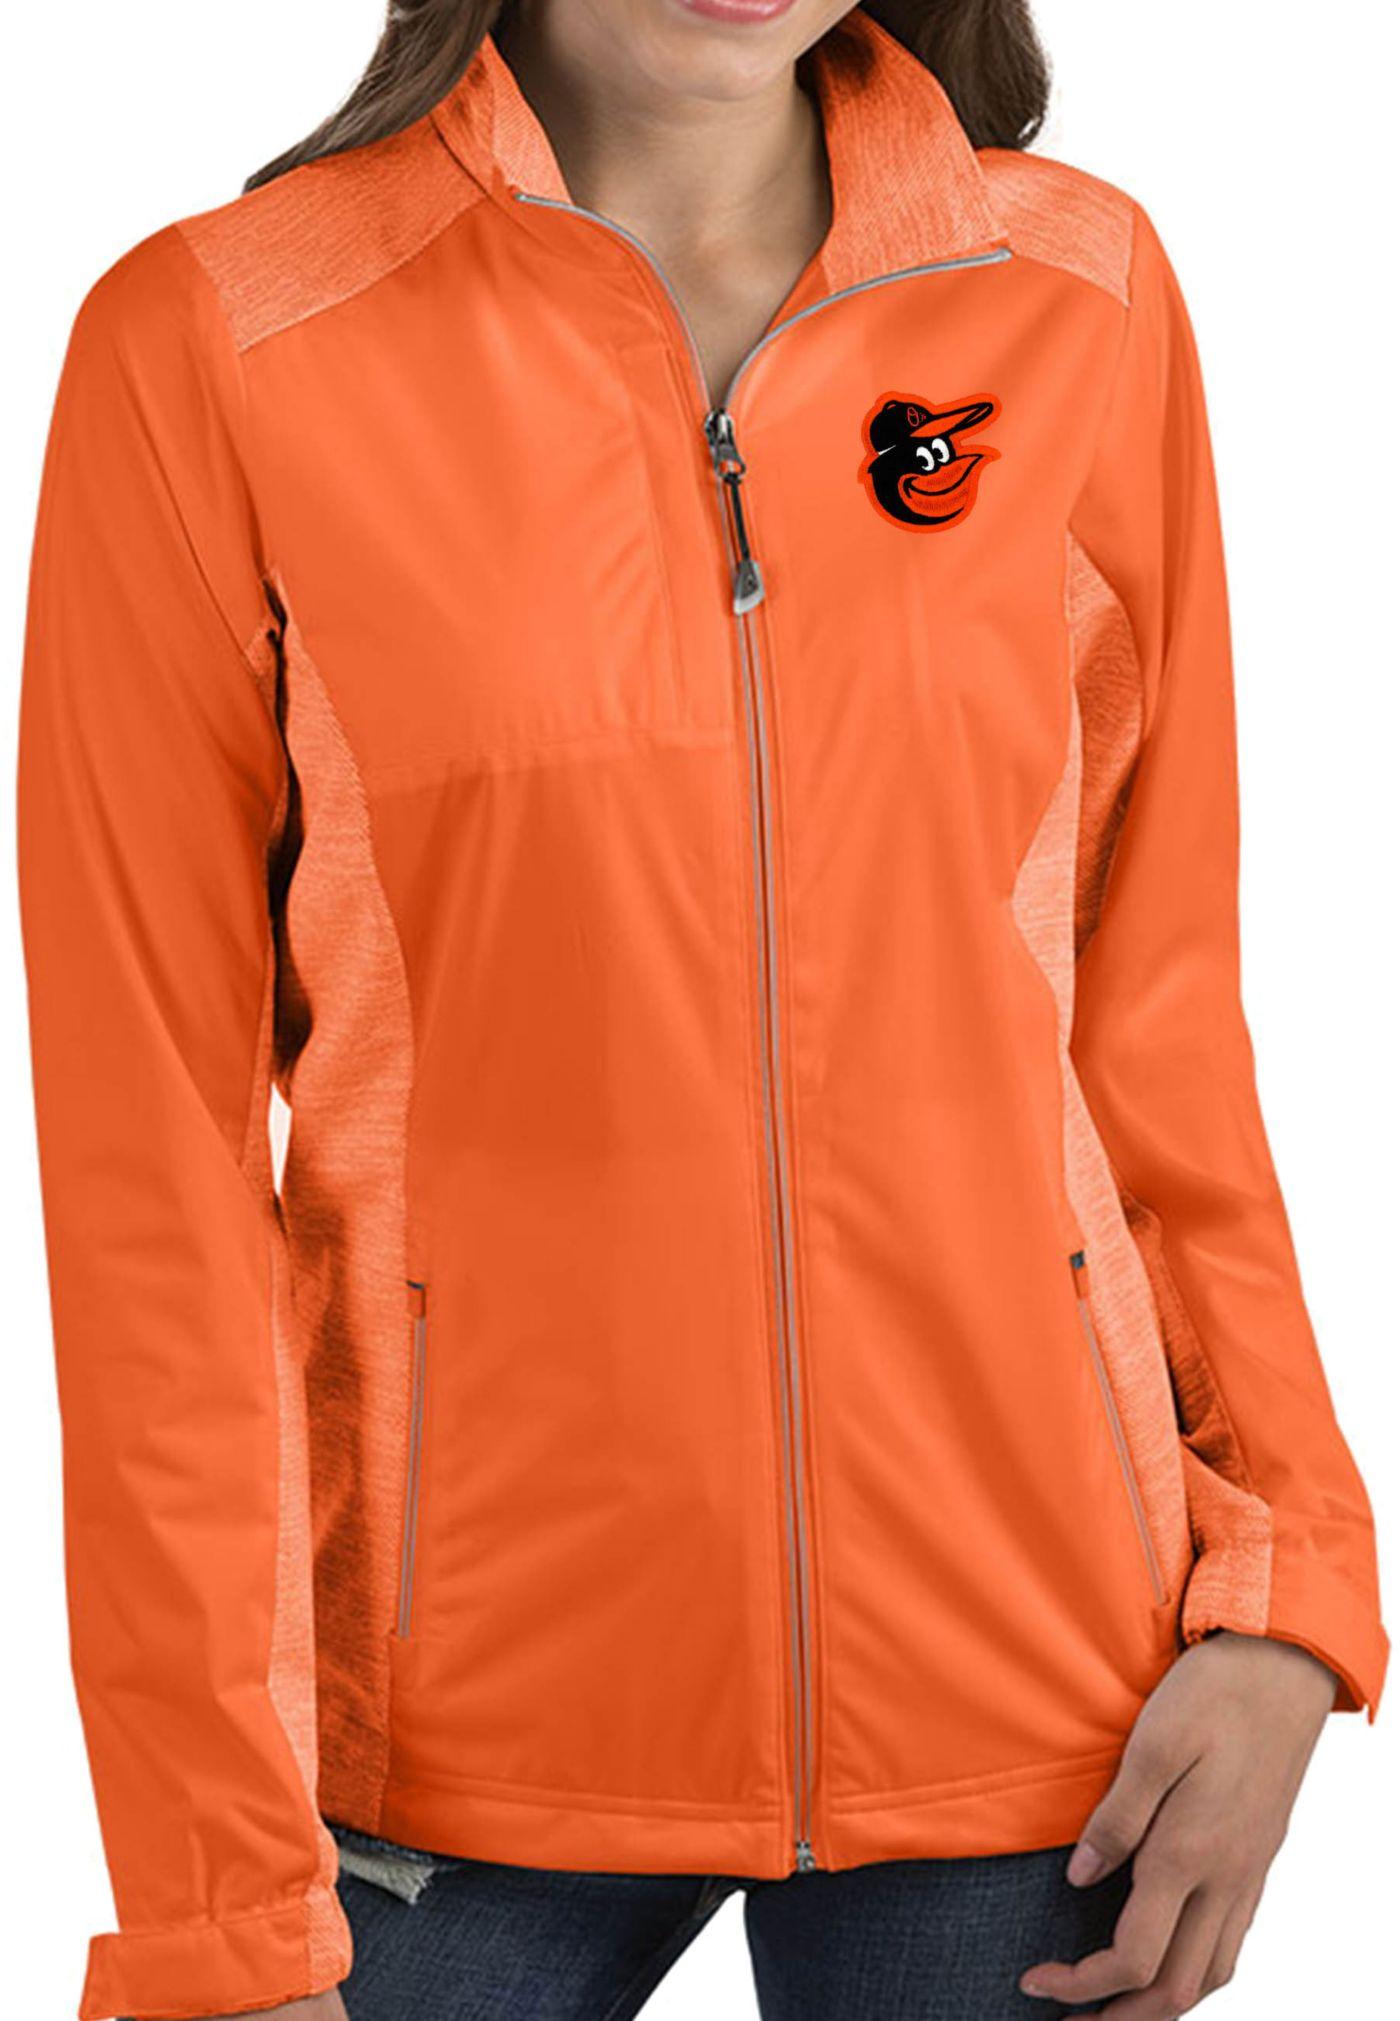 Antigua Women's Baltimore Orioles Revolve Orange Full-Zip Jacket